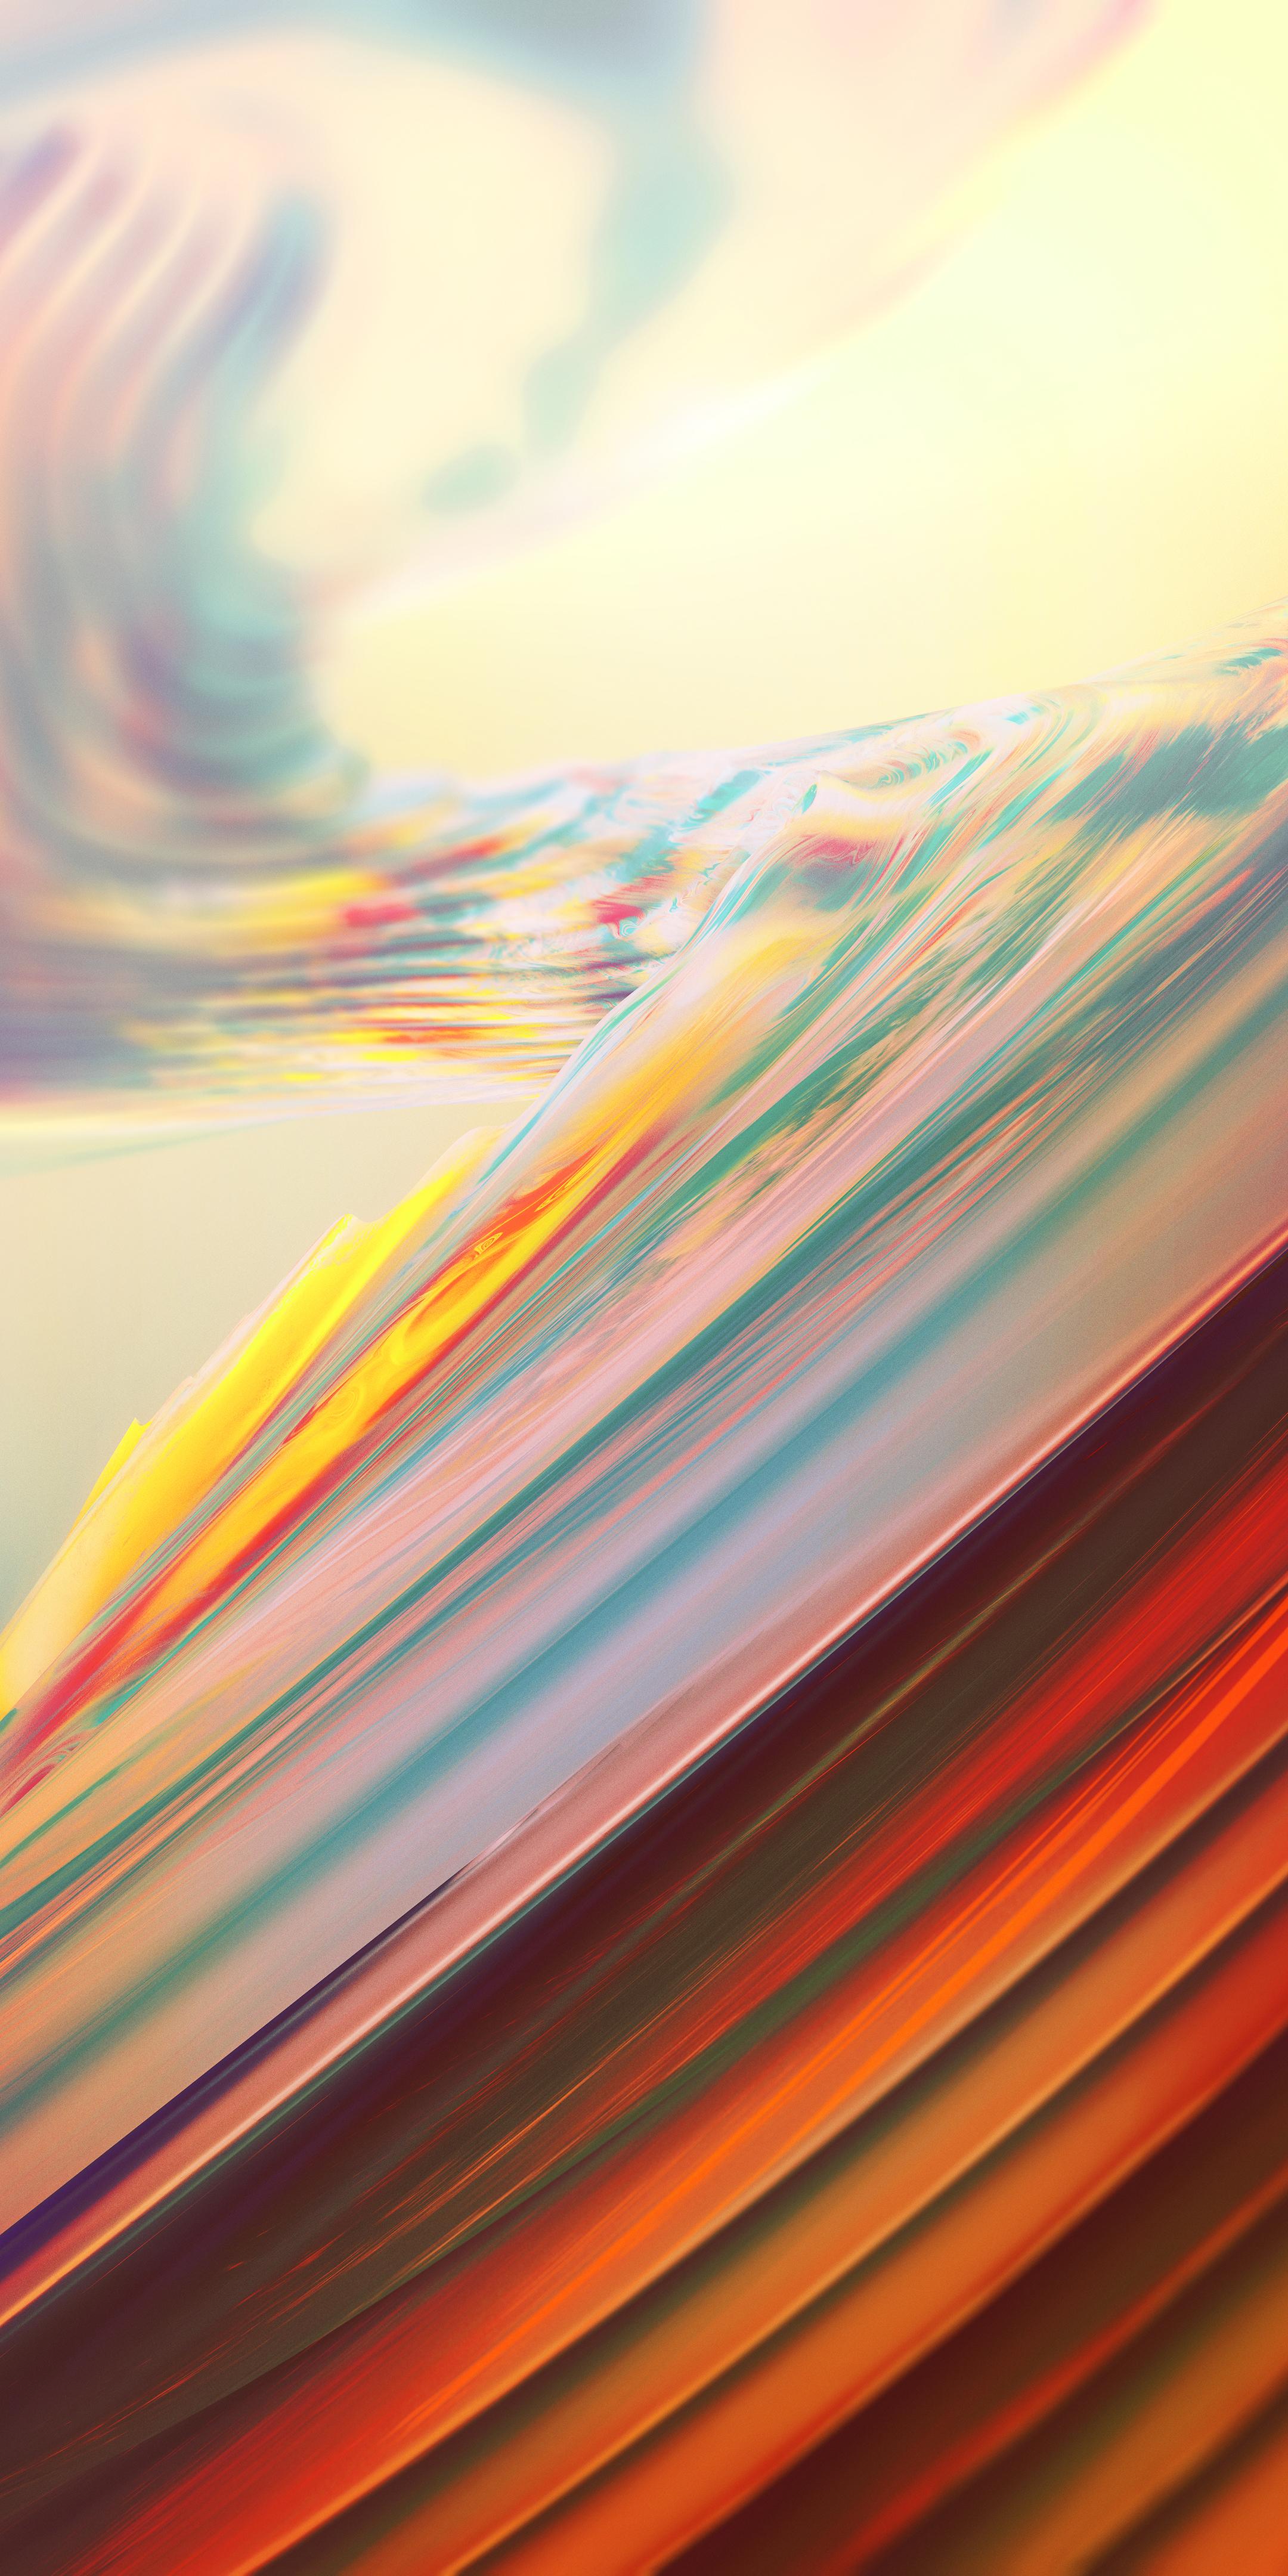 OnePlus 5T_OnePlus-5T-Wallpapers (3) - TechFoogle.com